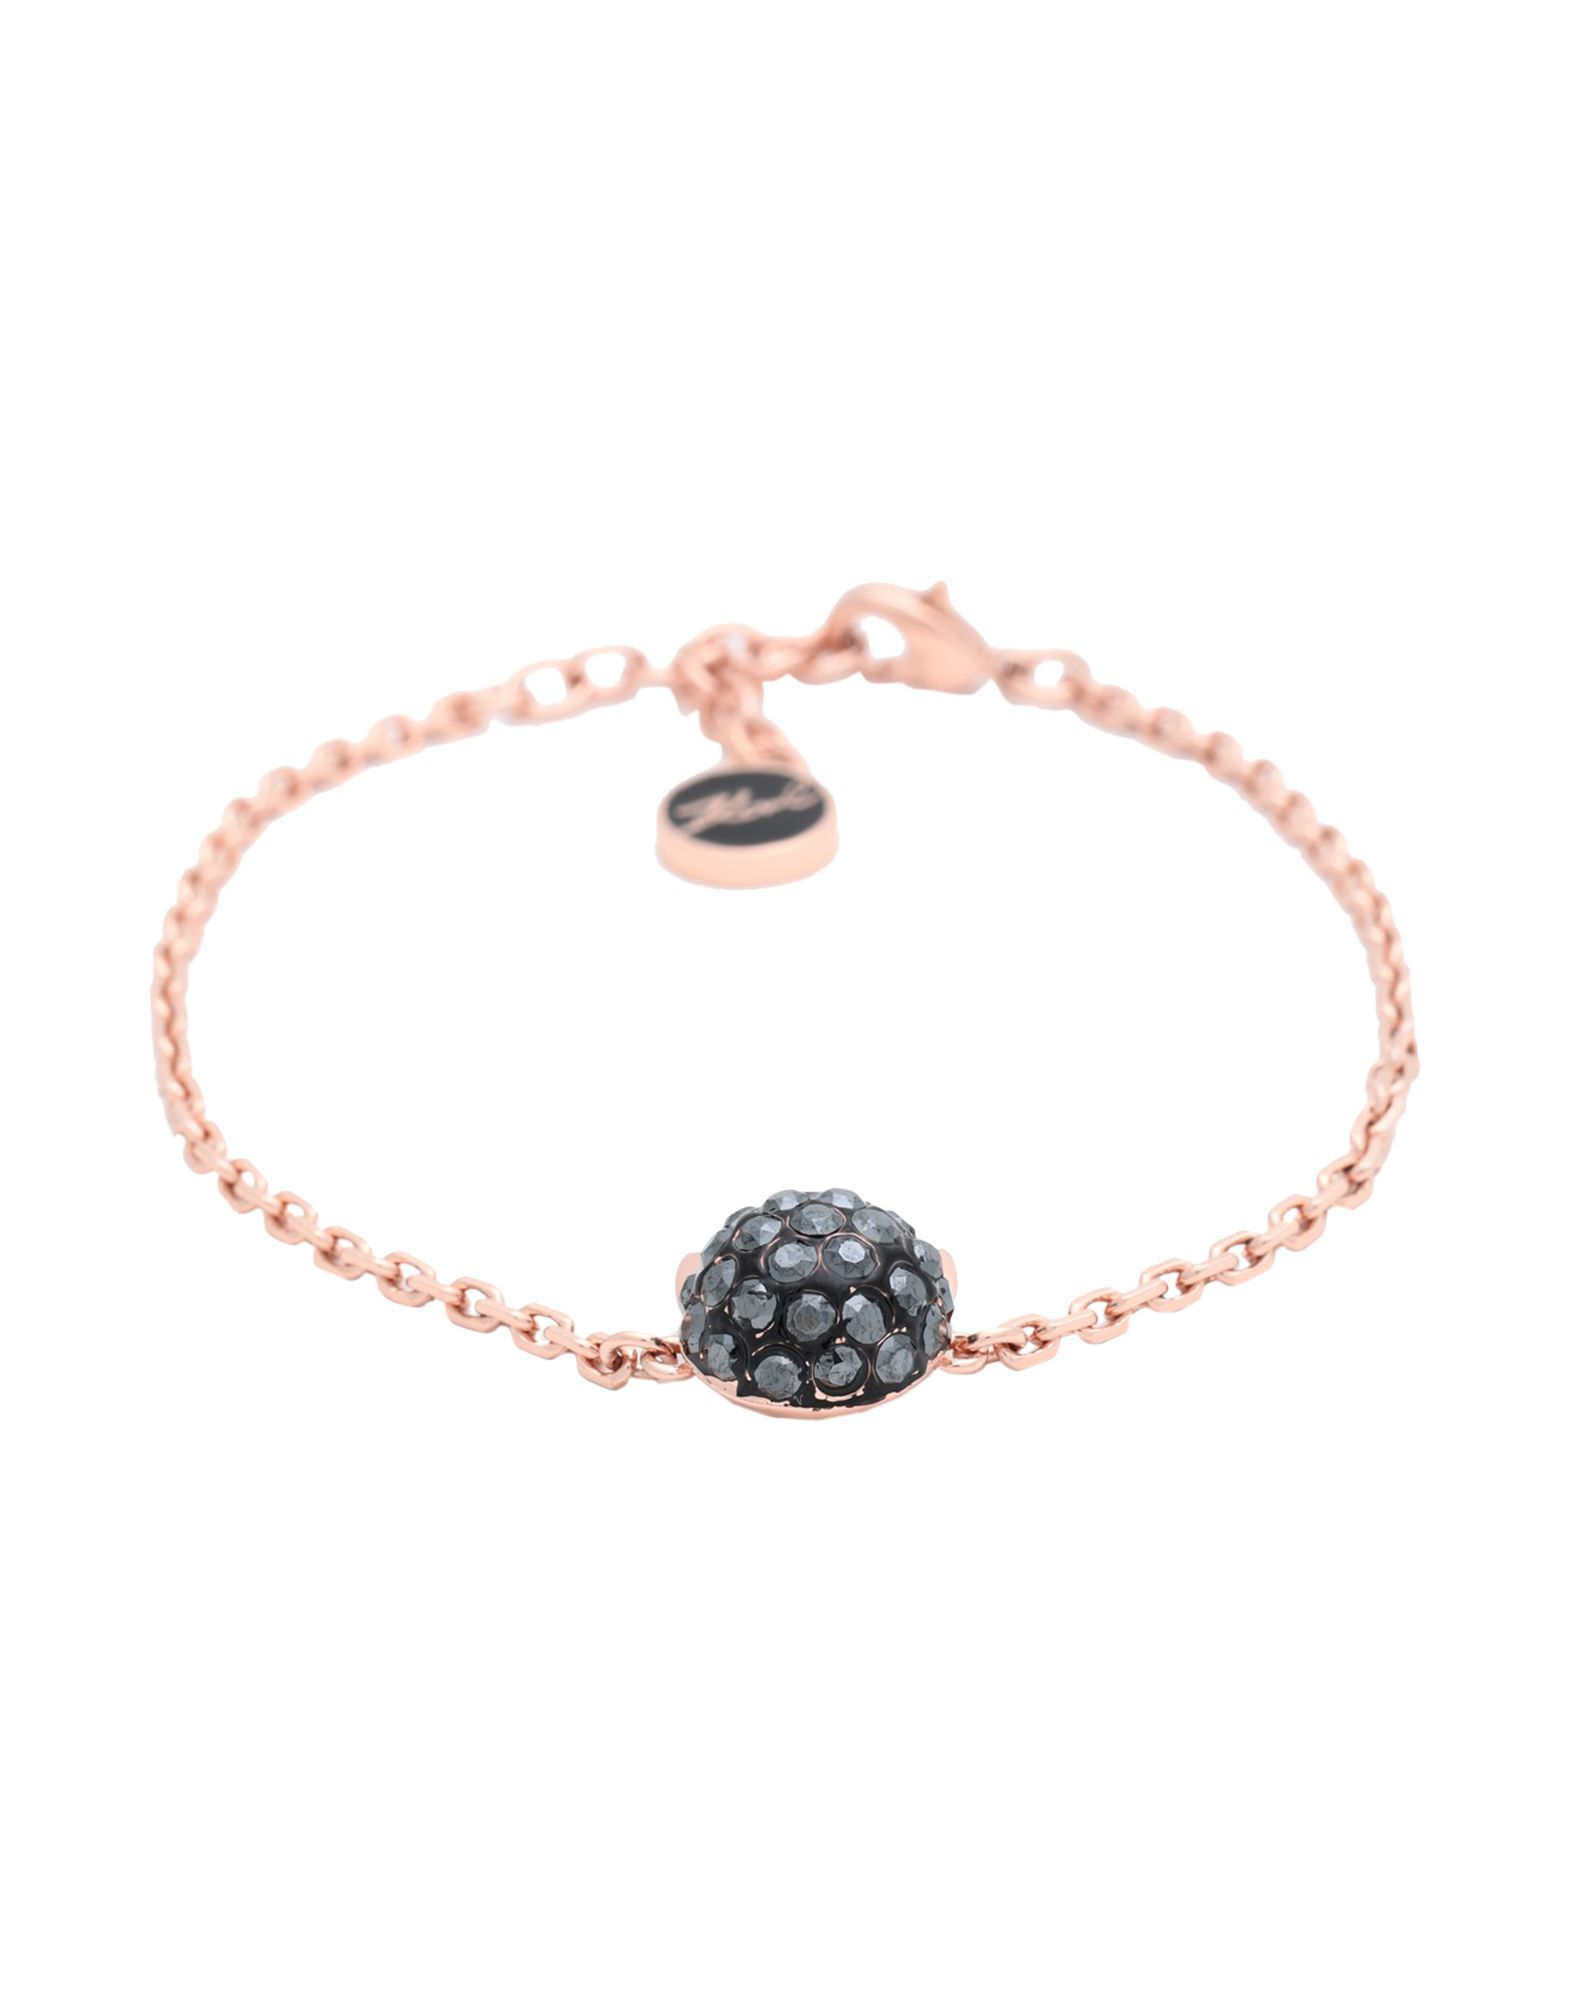 KARL LAGERFELD Bracelets - Item 50243643